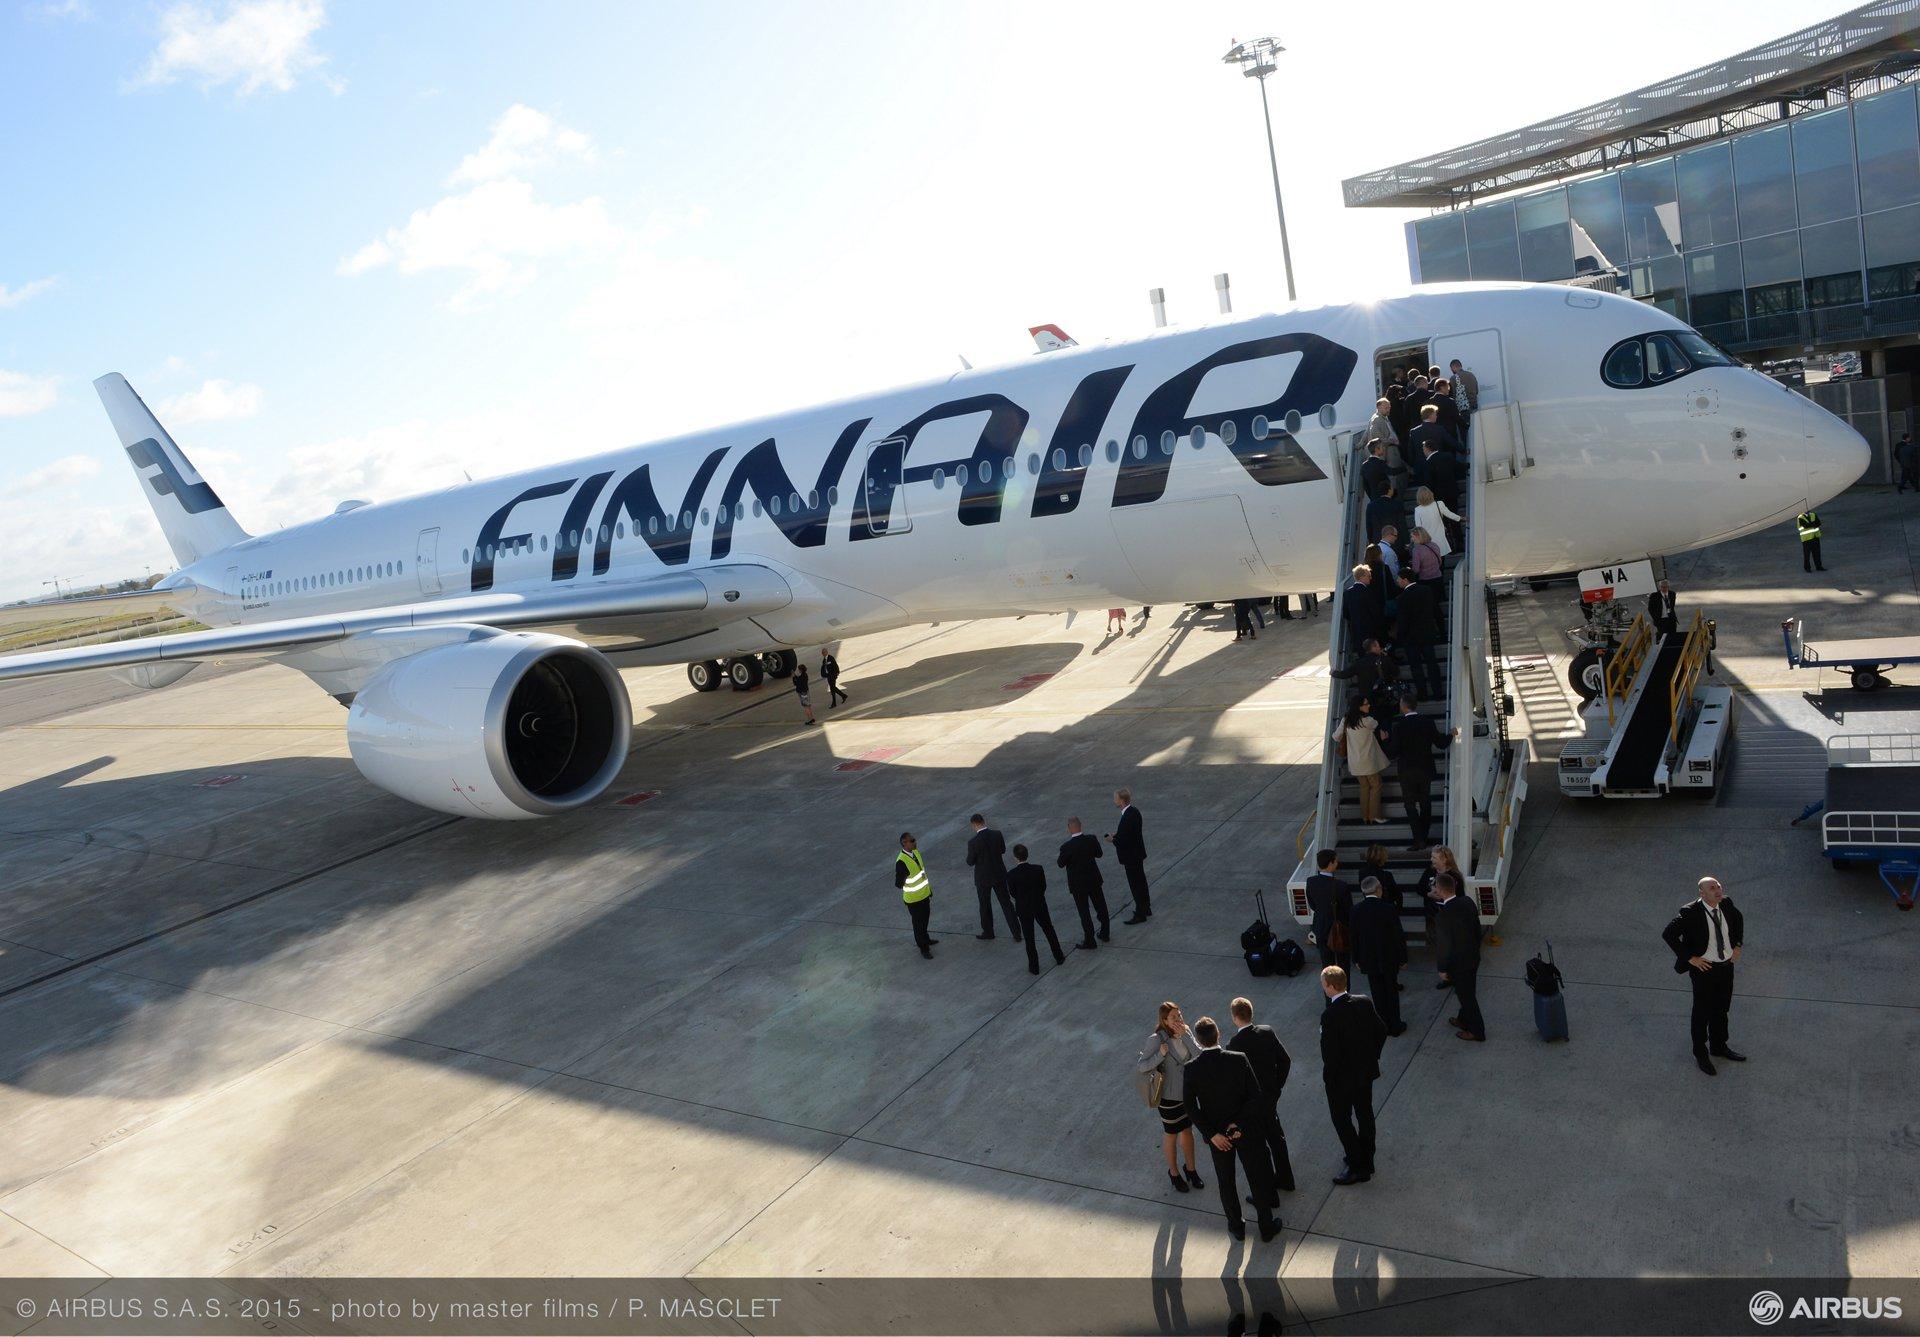 A350 XWB_Finnair first delivery 19